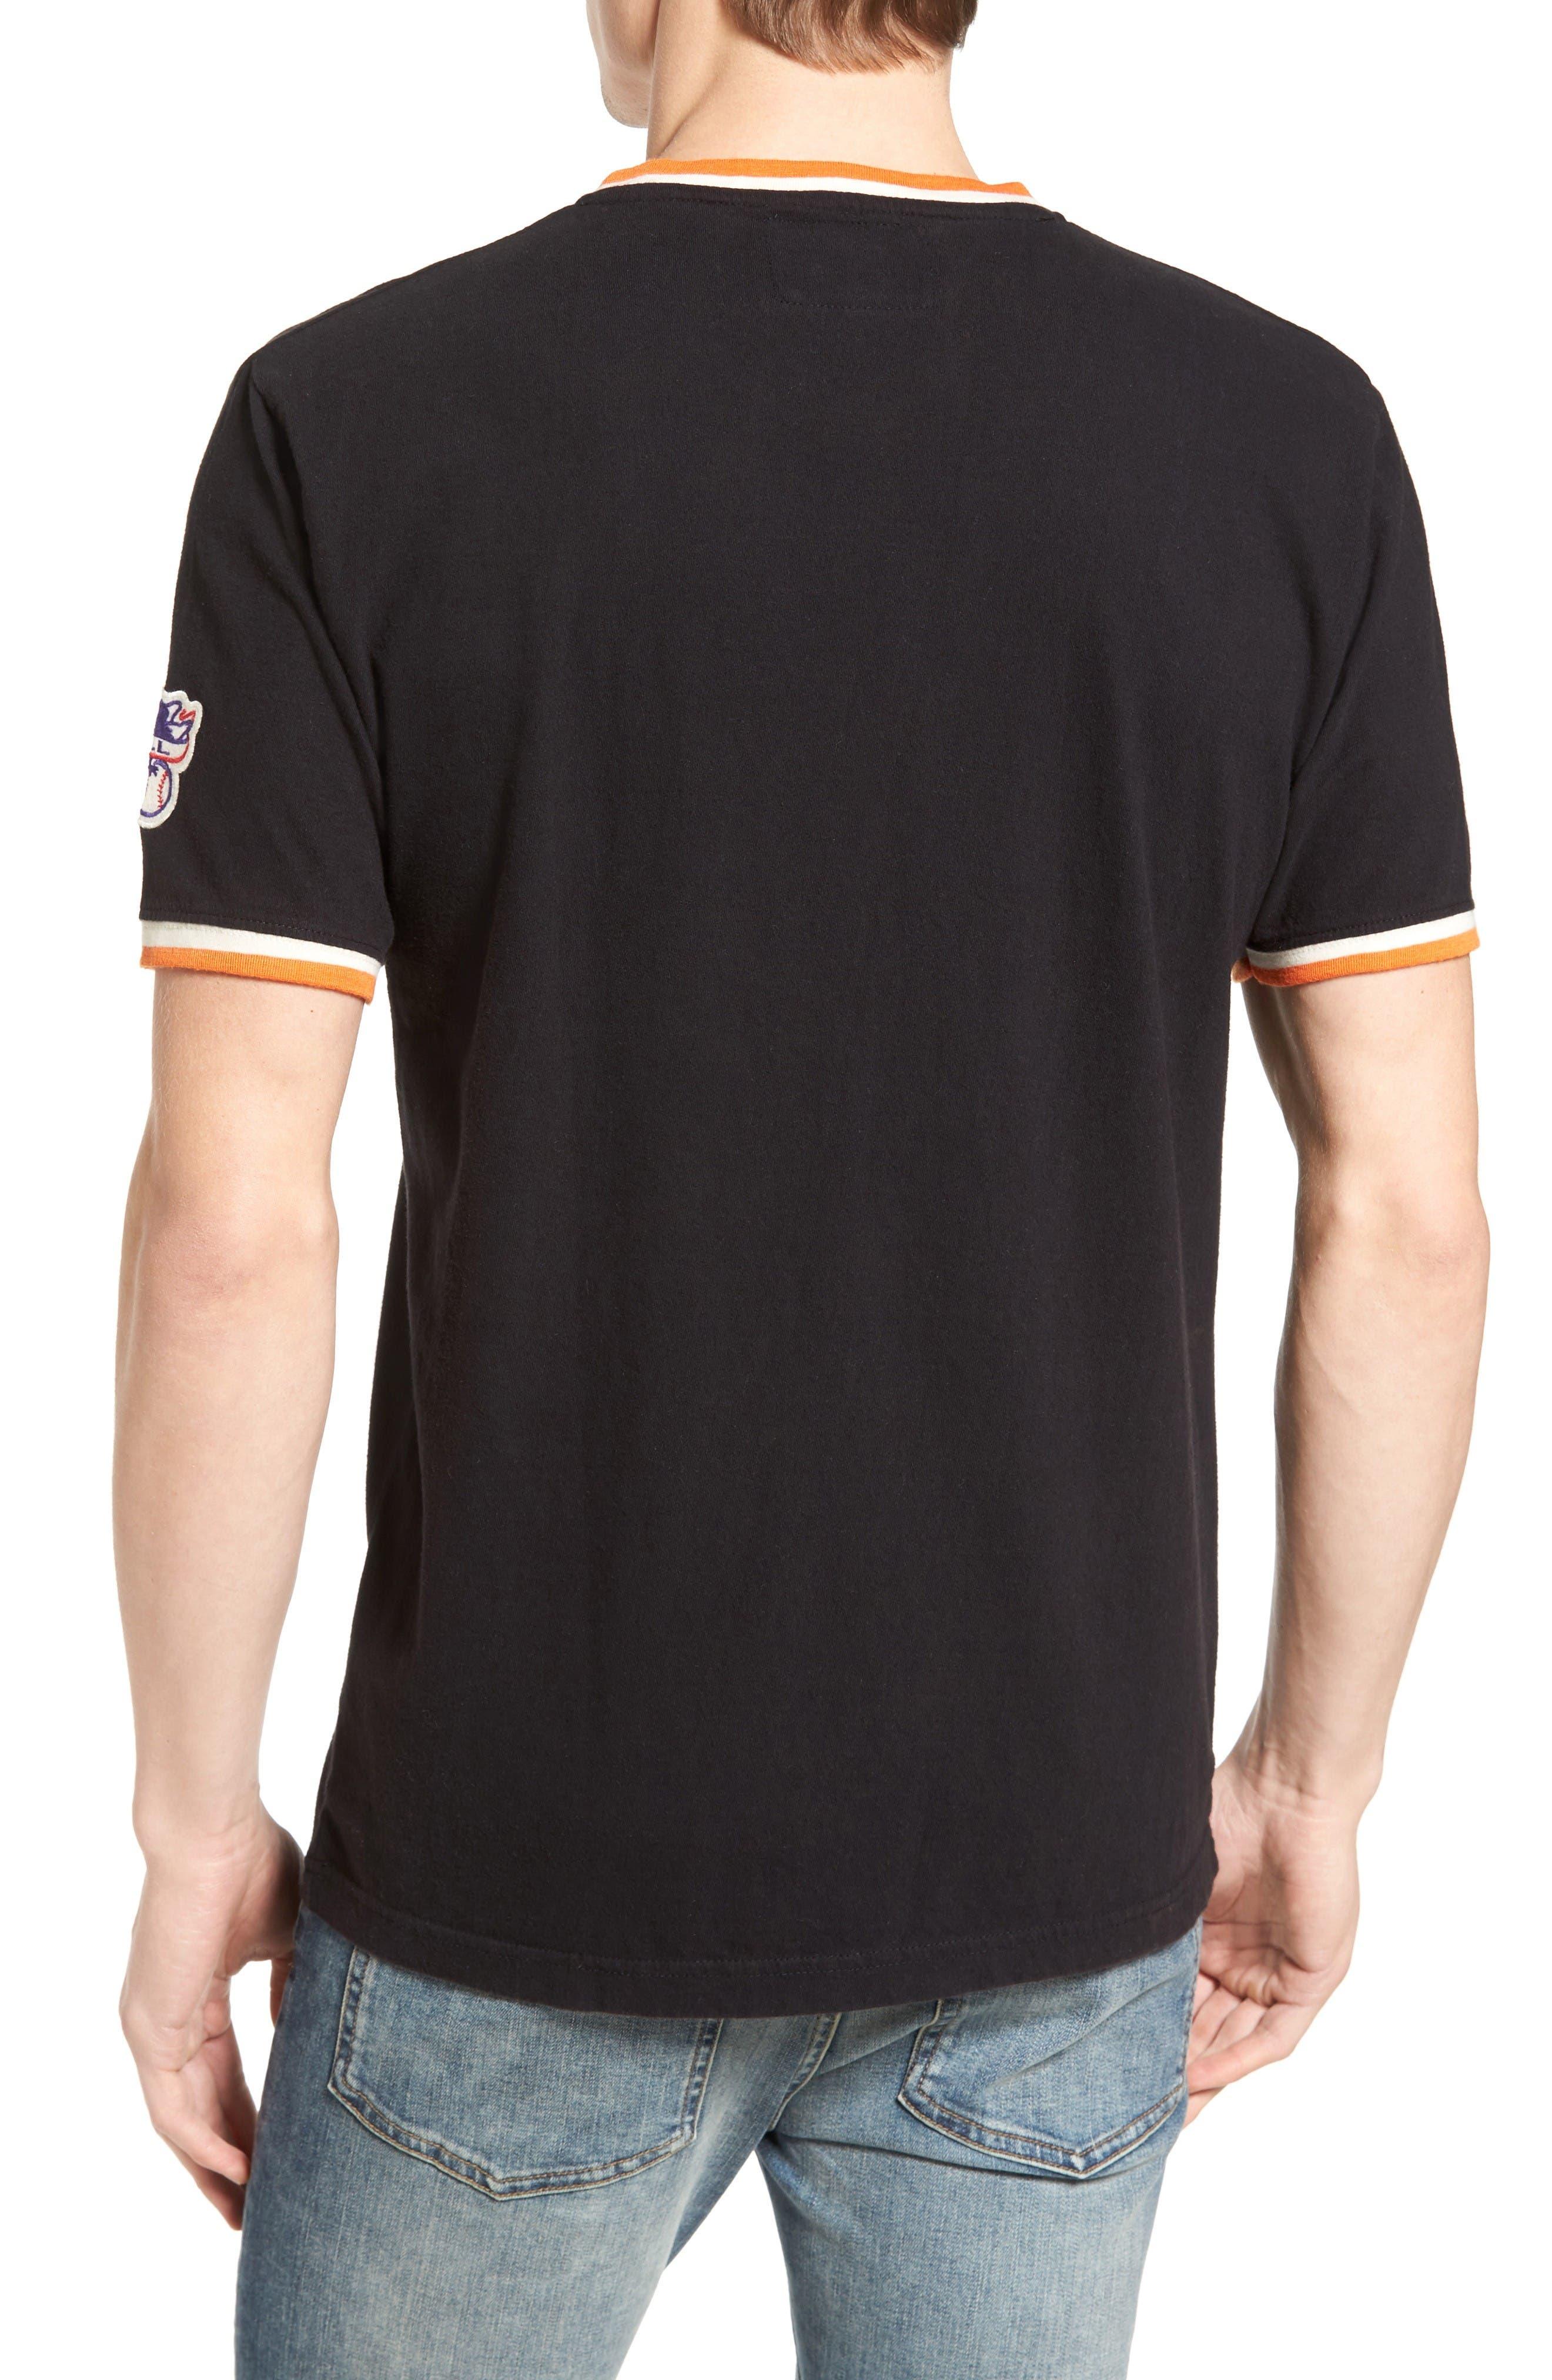 Eastwood Baltimore Orioles T-Shirt,                             Alternate thumbnail 2, color,                             Black